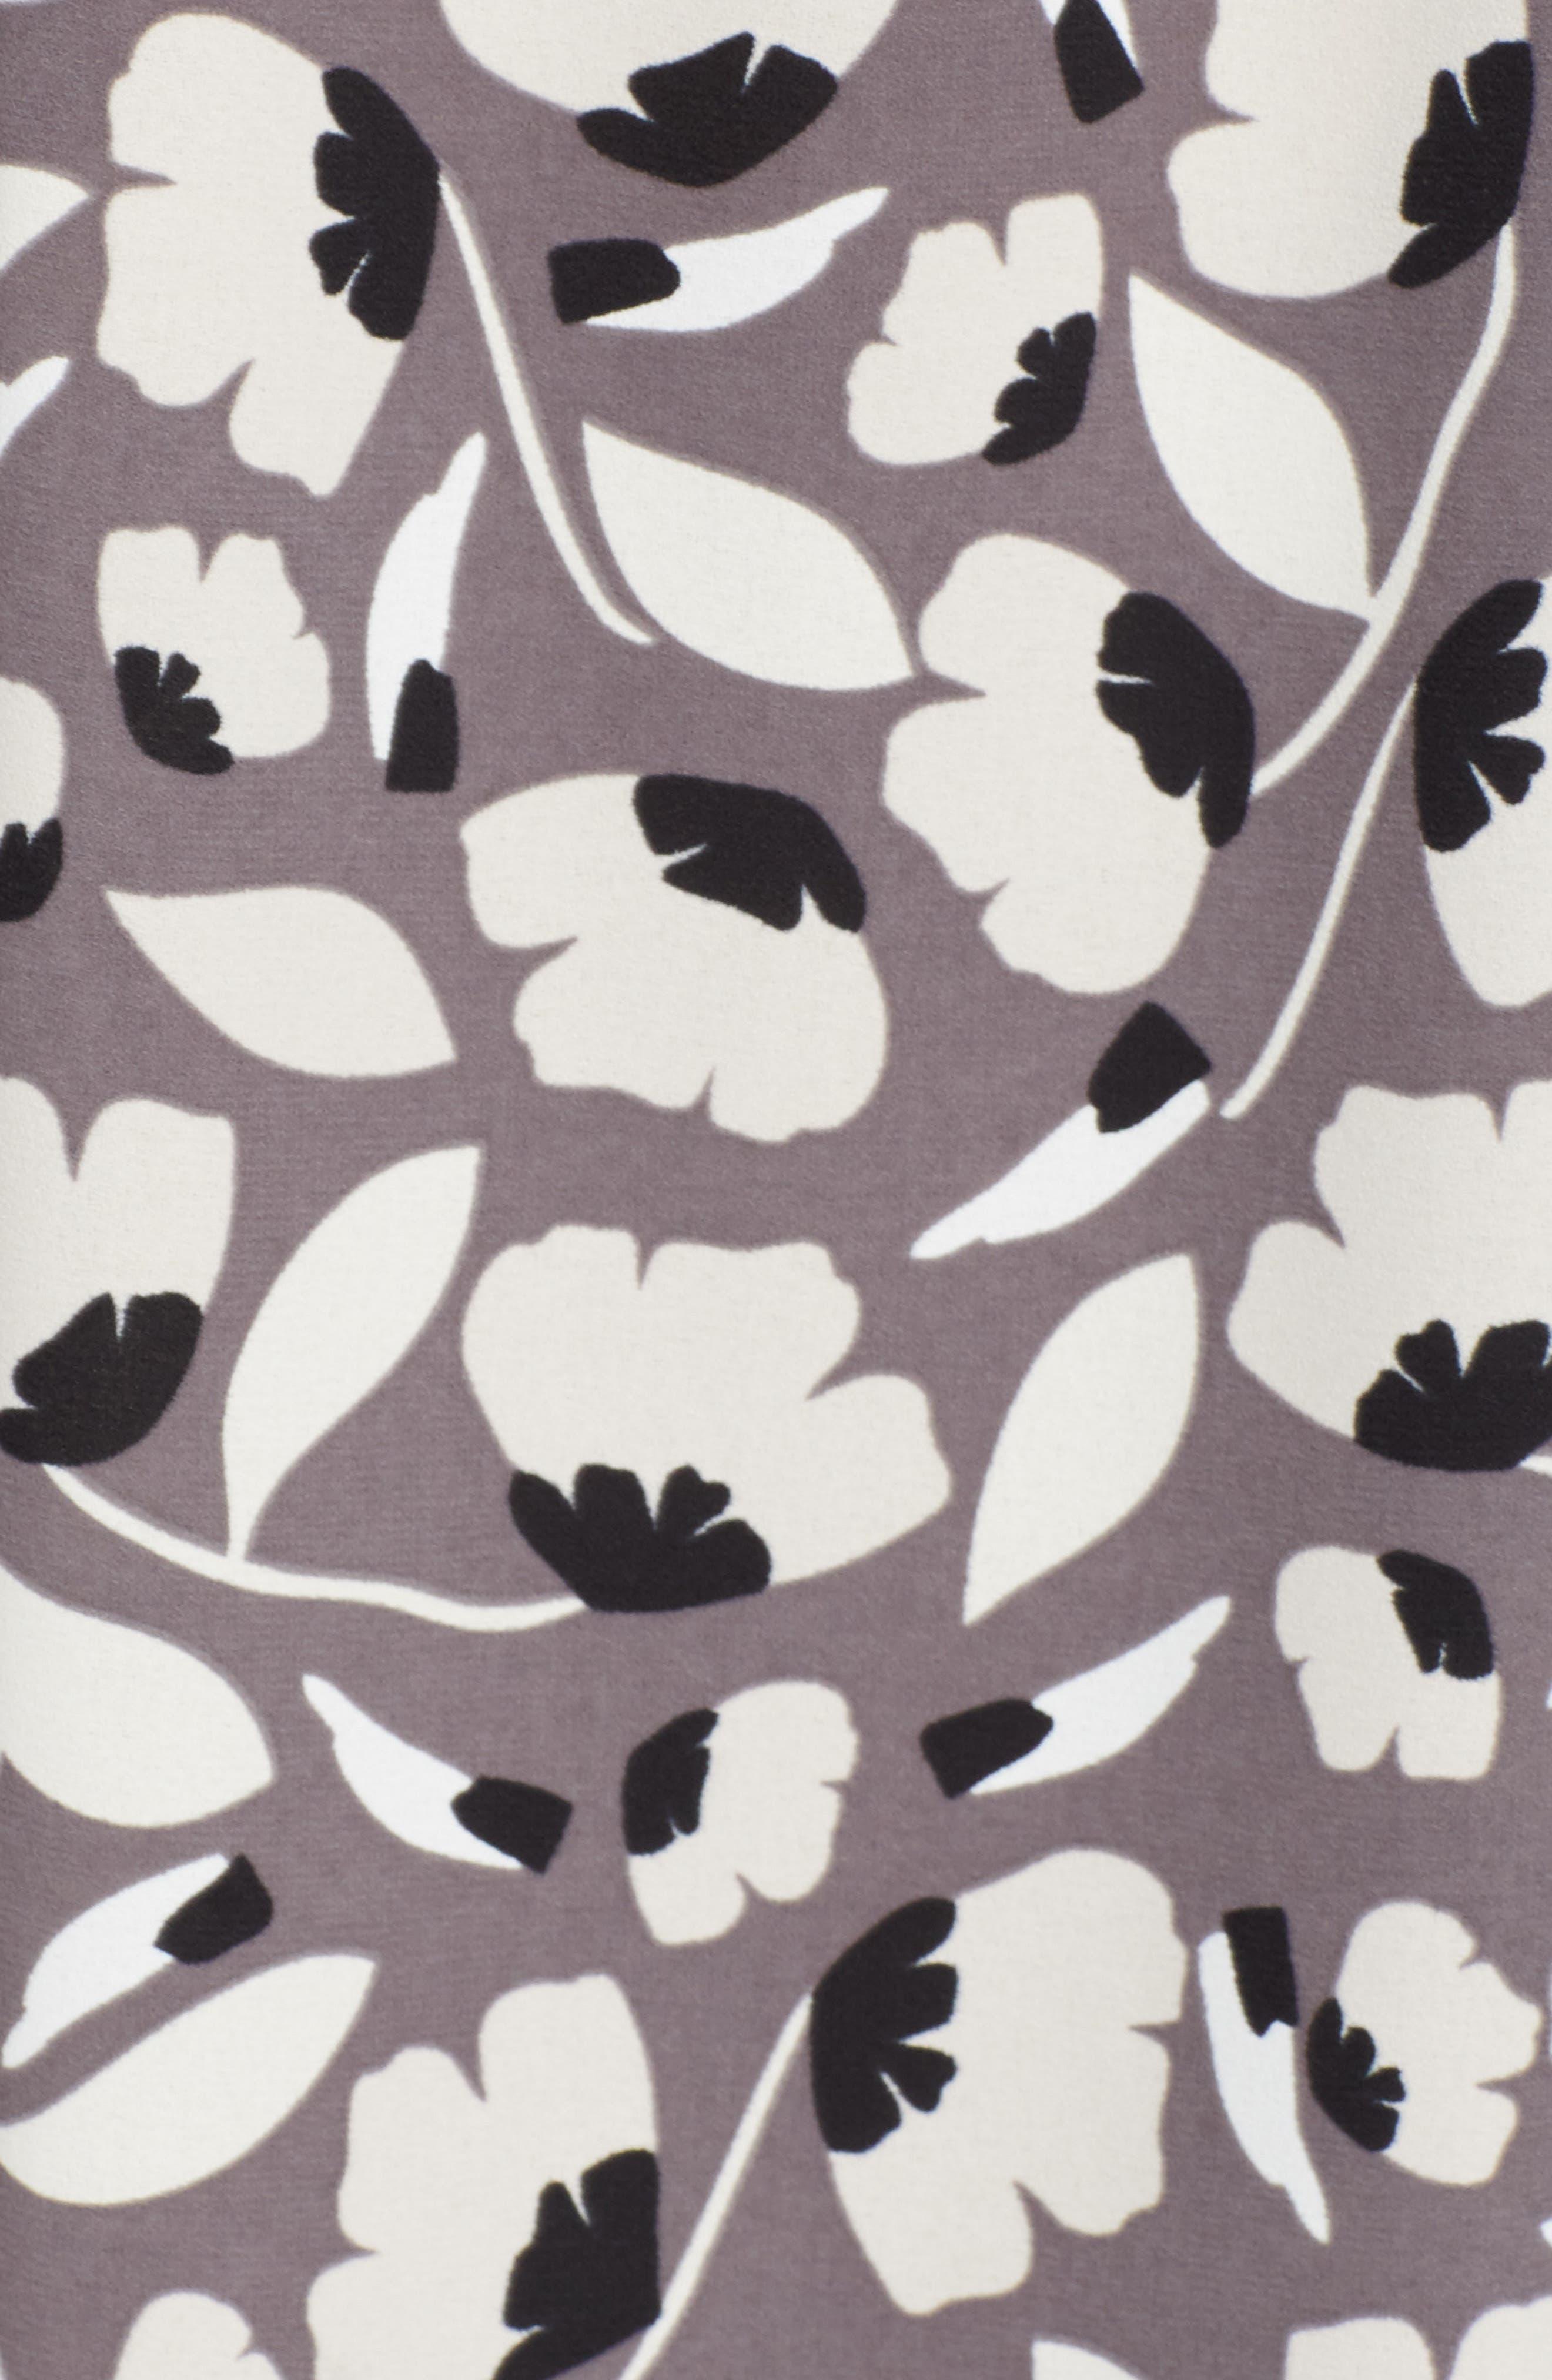 Floral Drawstring Dress,                             Alternate thumbnail 6, color,                             020